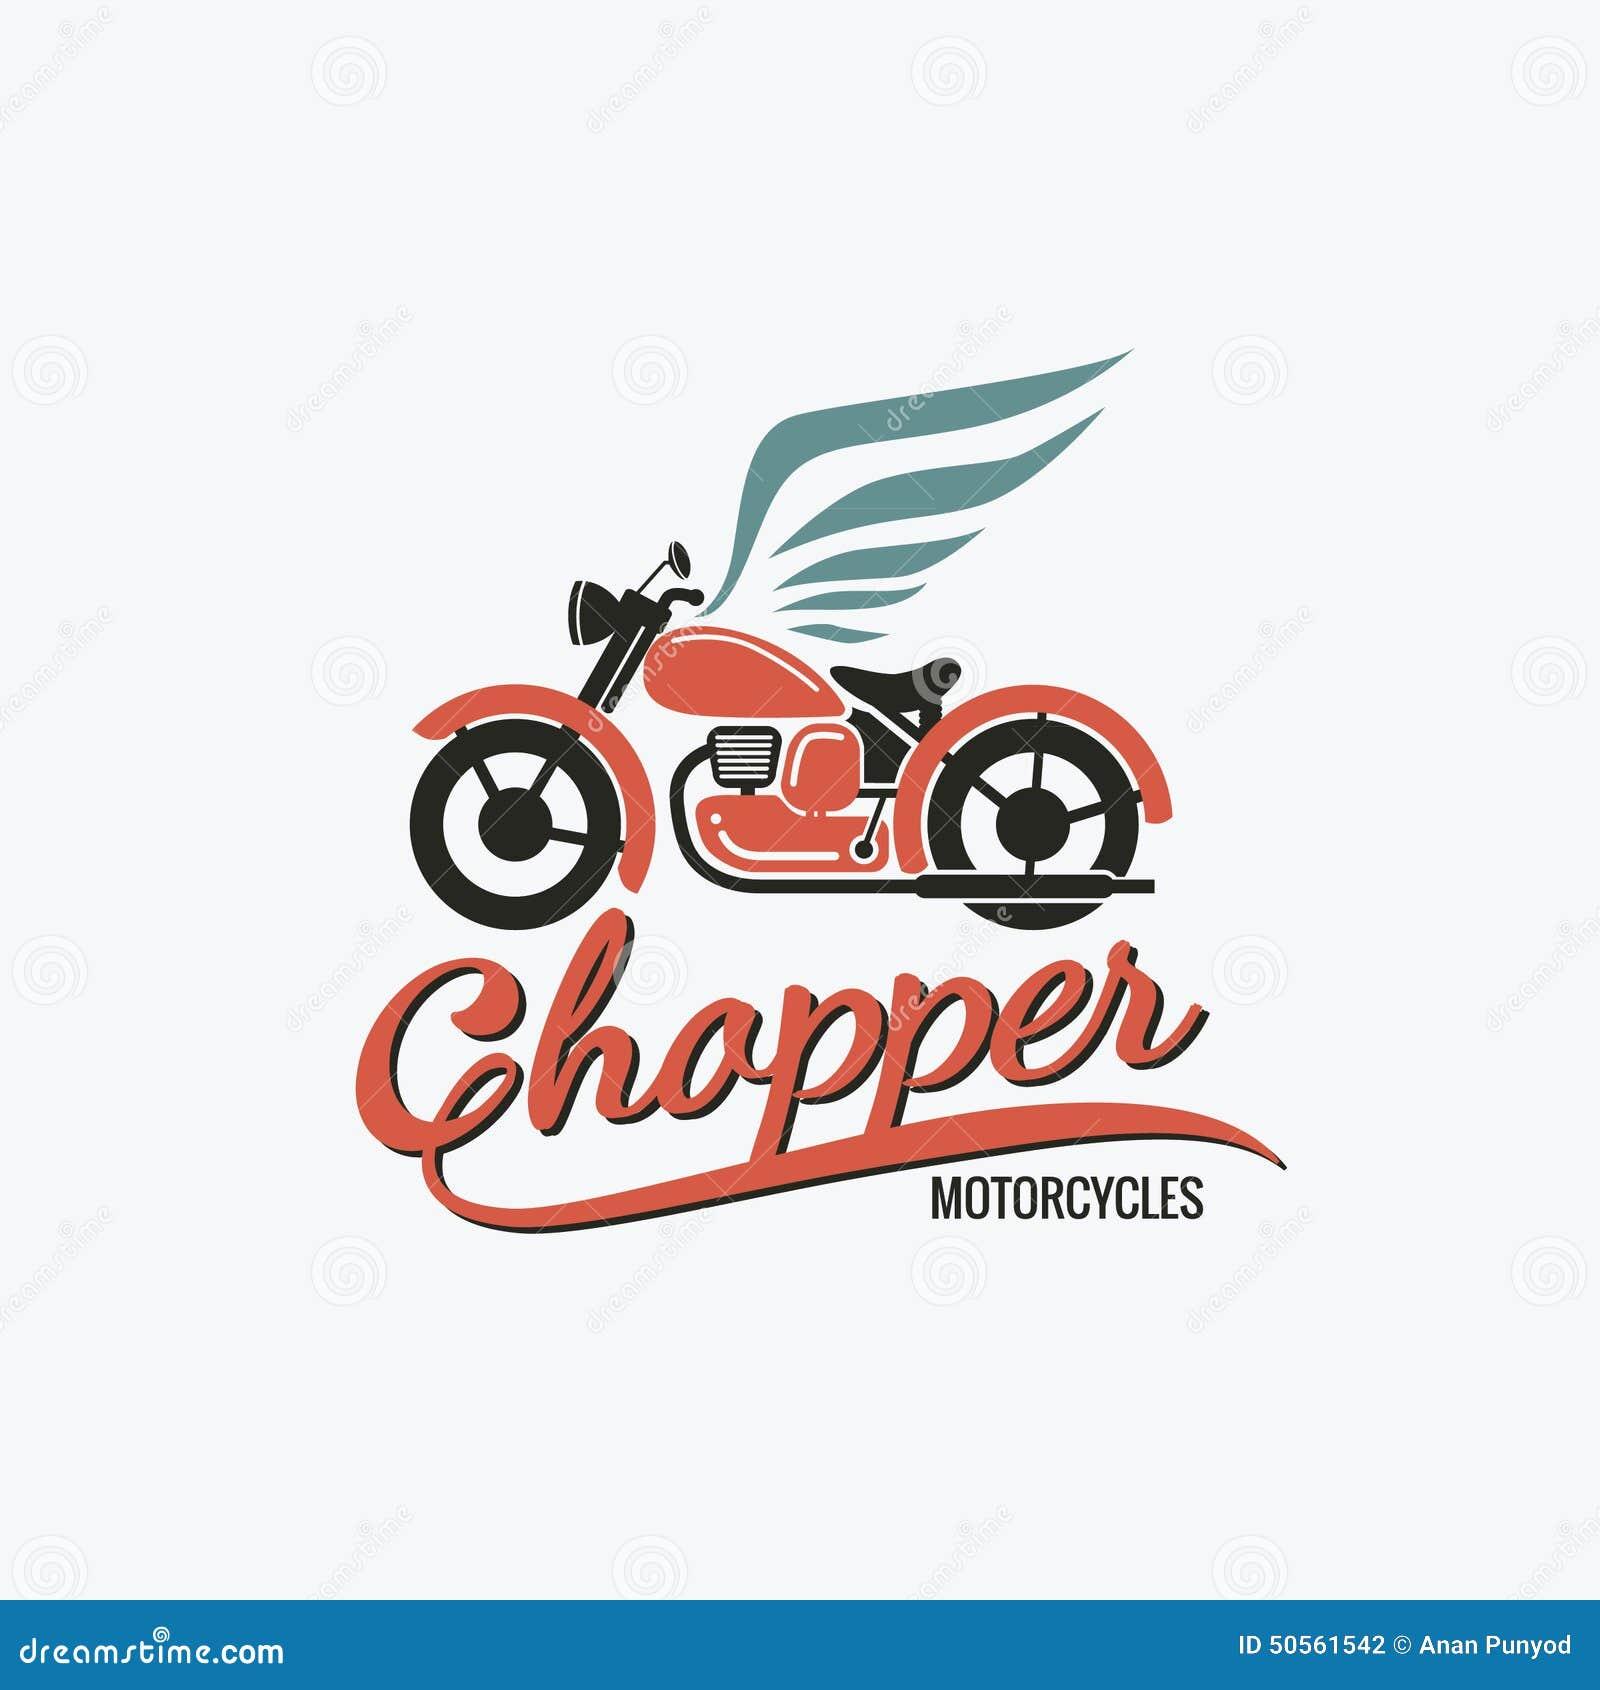 Orange Chopper Motorcycle Logo Stock Vector - Image: 50561542